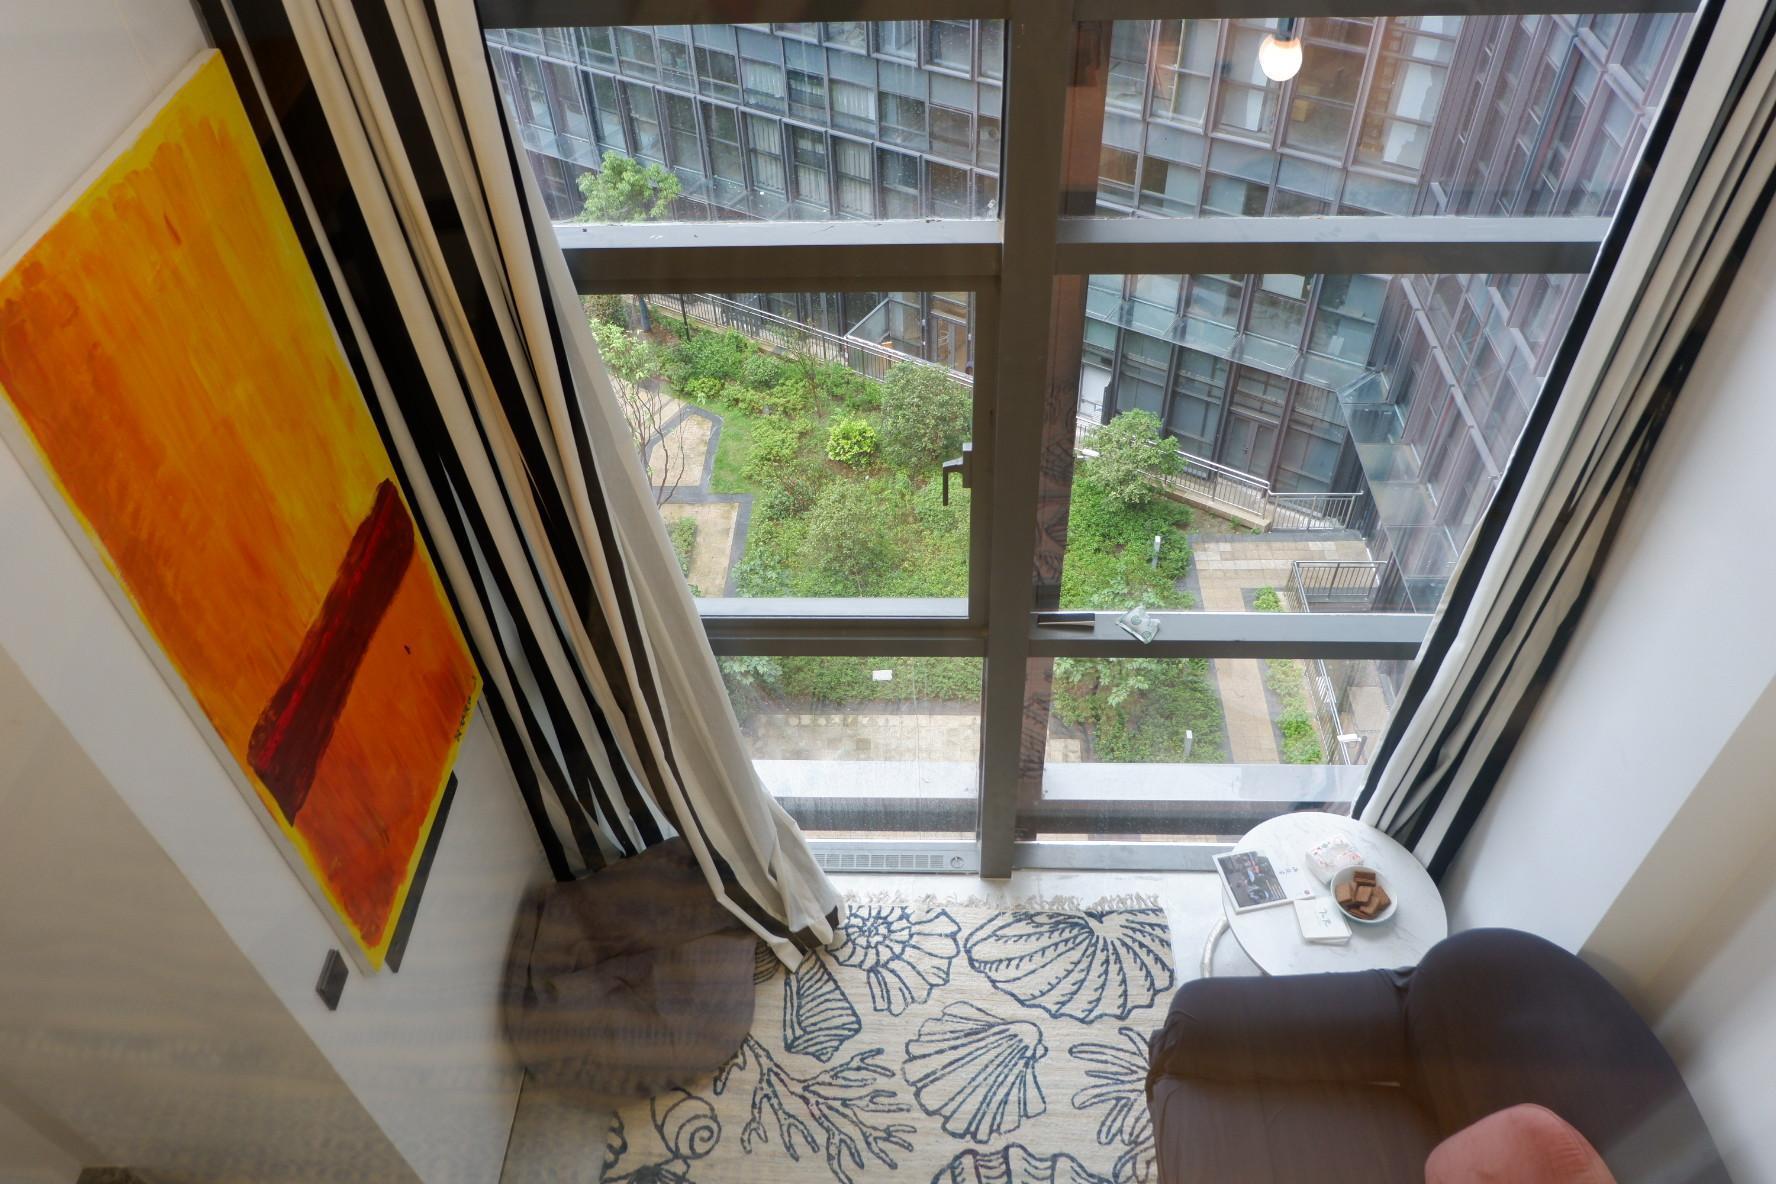 River view,Heart of shanghai, modern decor loft